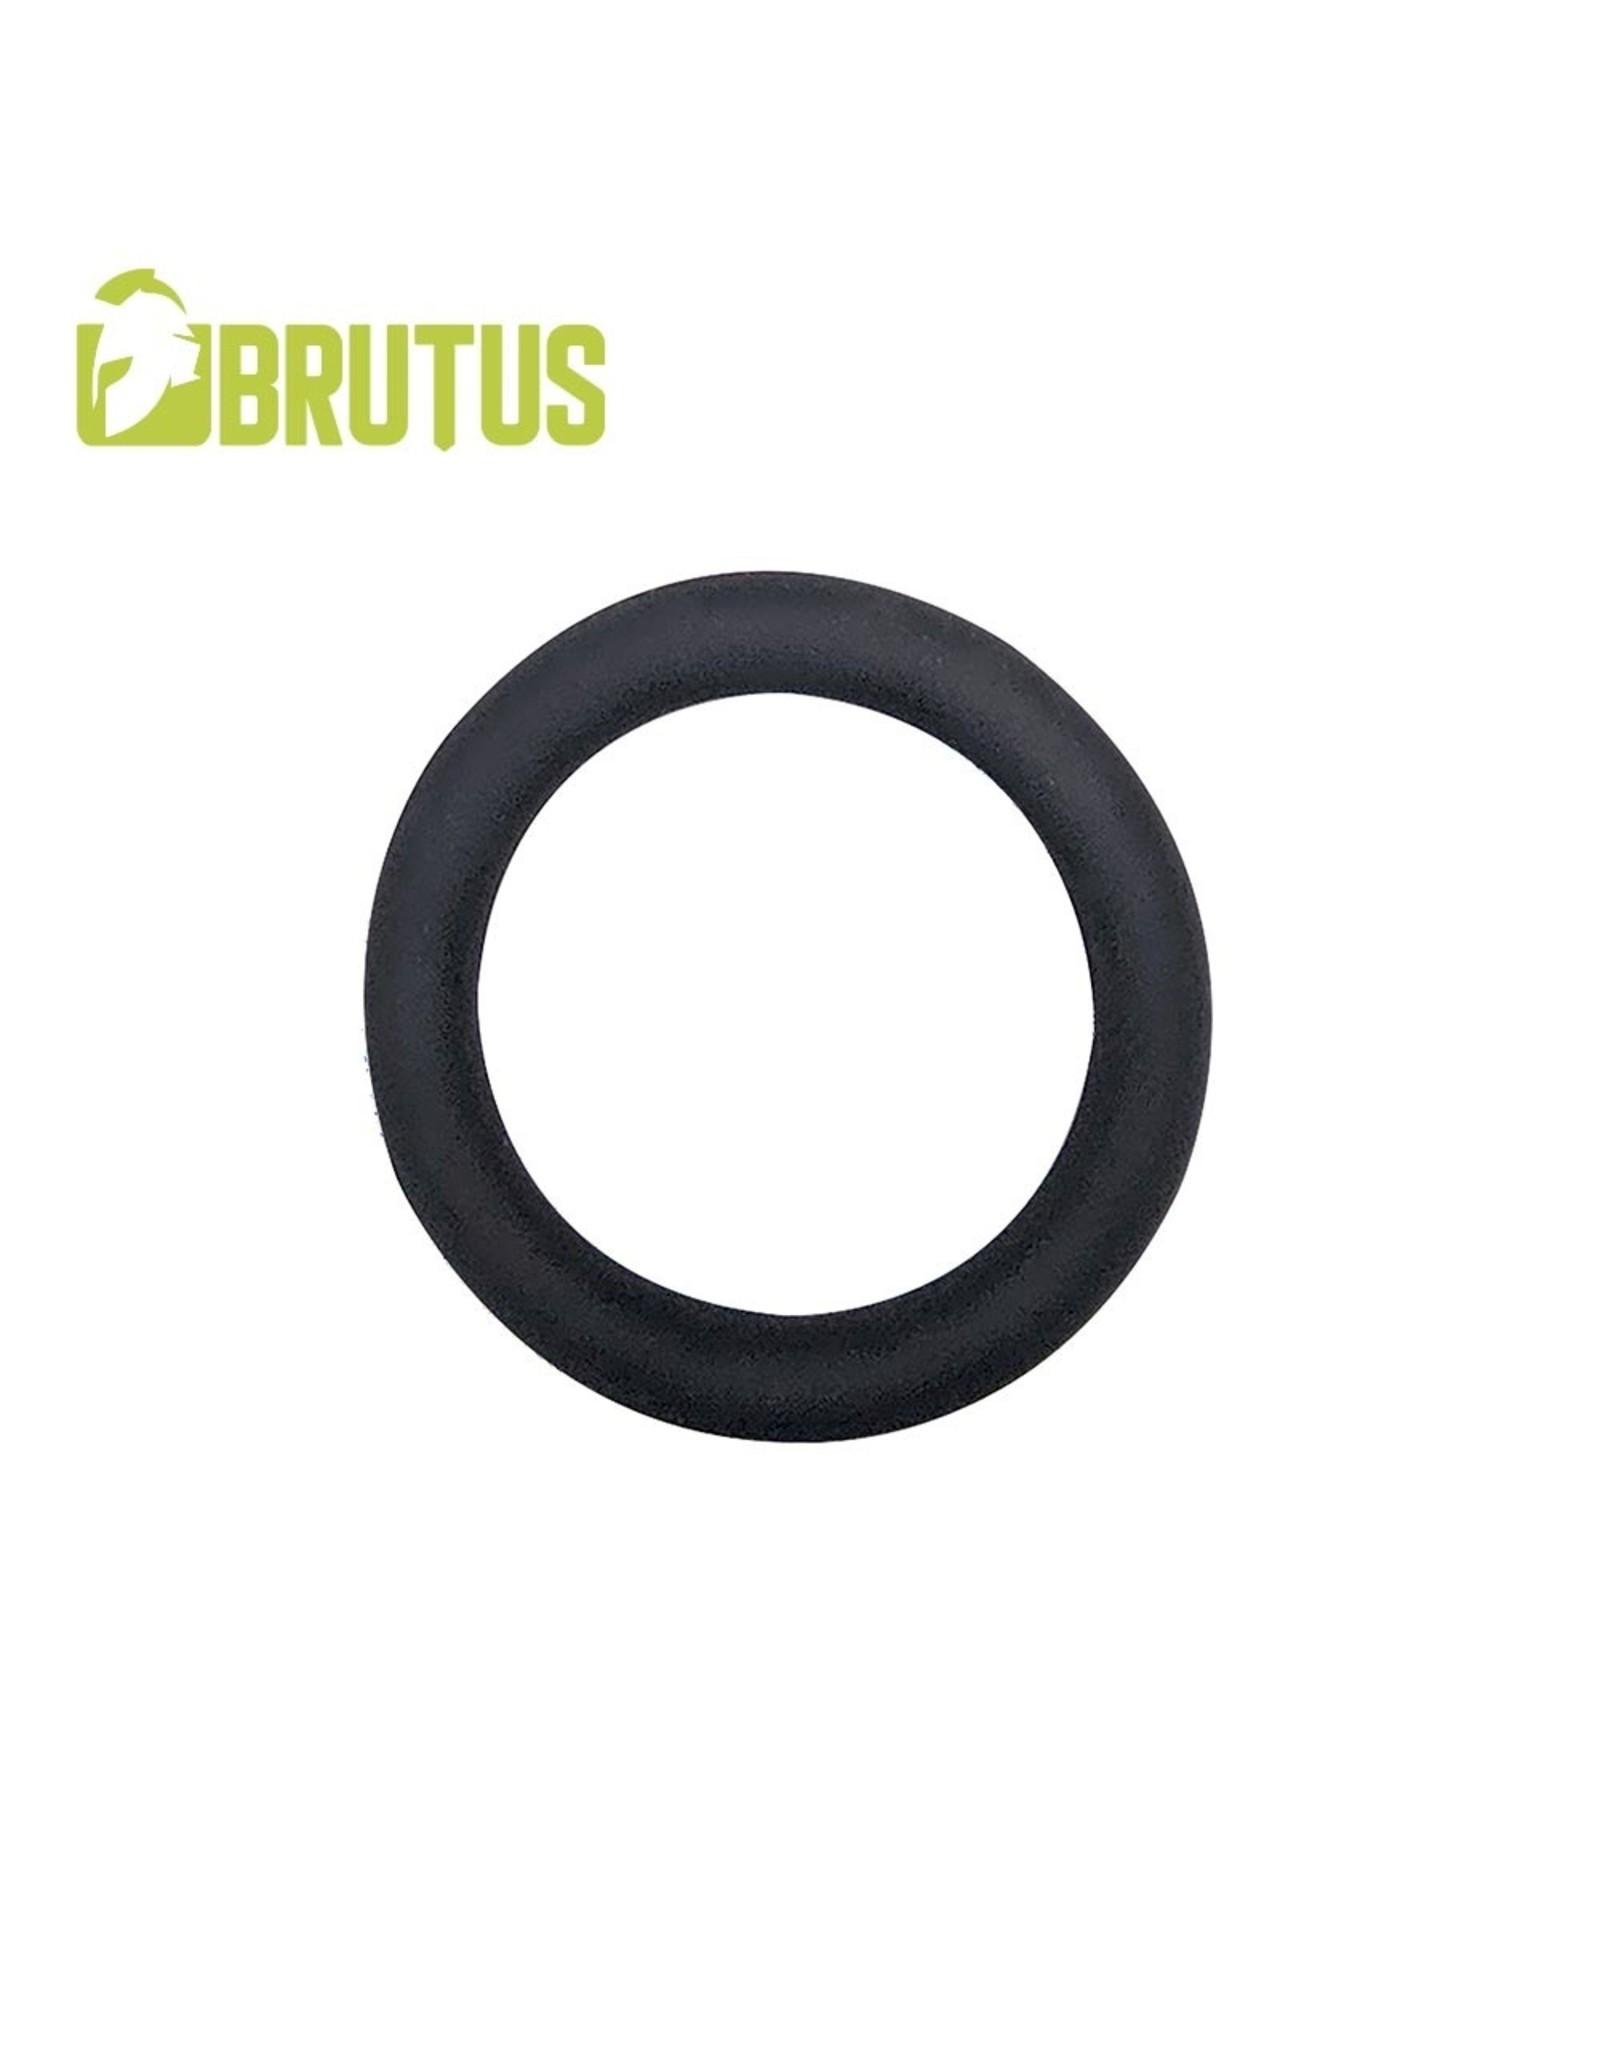 Brutus Brutus Slim Donut Silicone Cock Ring